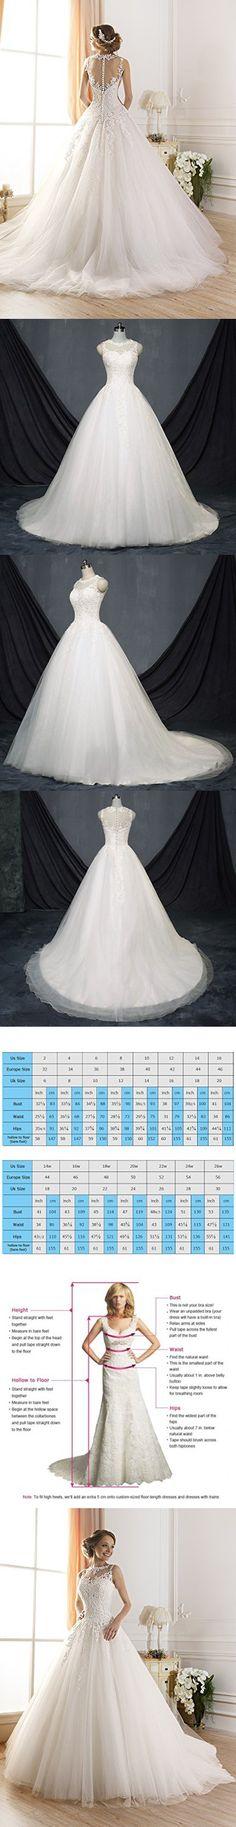 TBB Illusion Lace Ball Gown casamento Elegant Long Wedding dresses (20Plus)